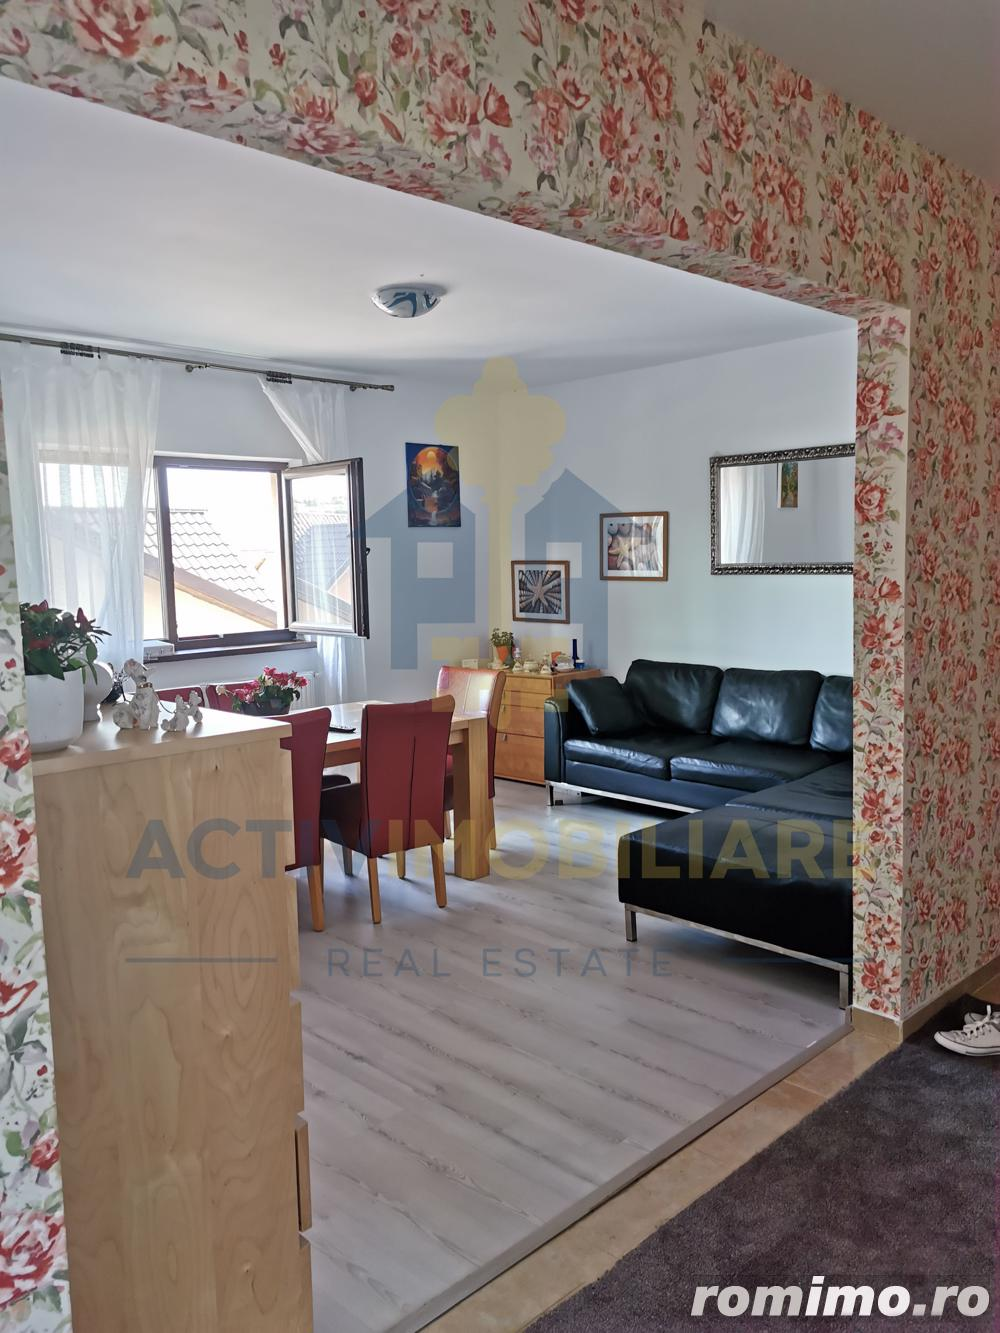 Apartament 3 camere, CUG-zona Horpaz, 75 mp utili